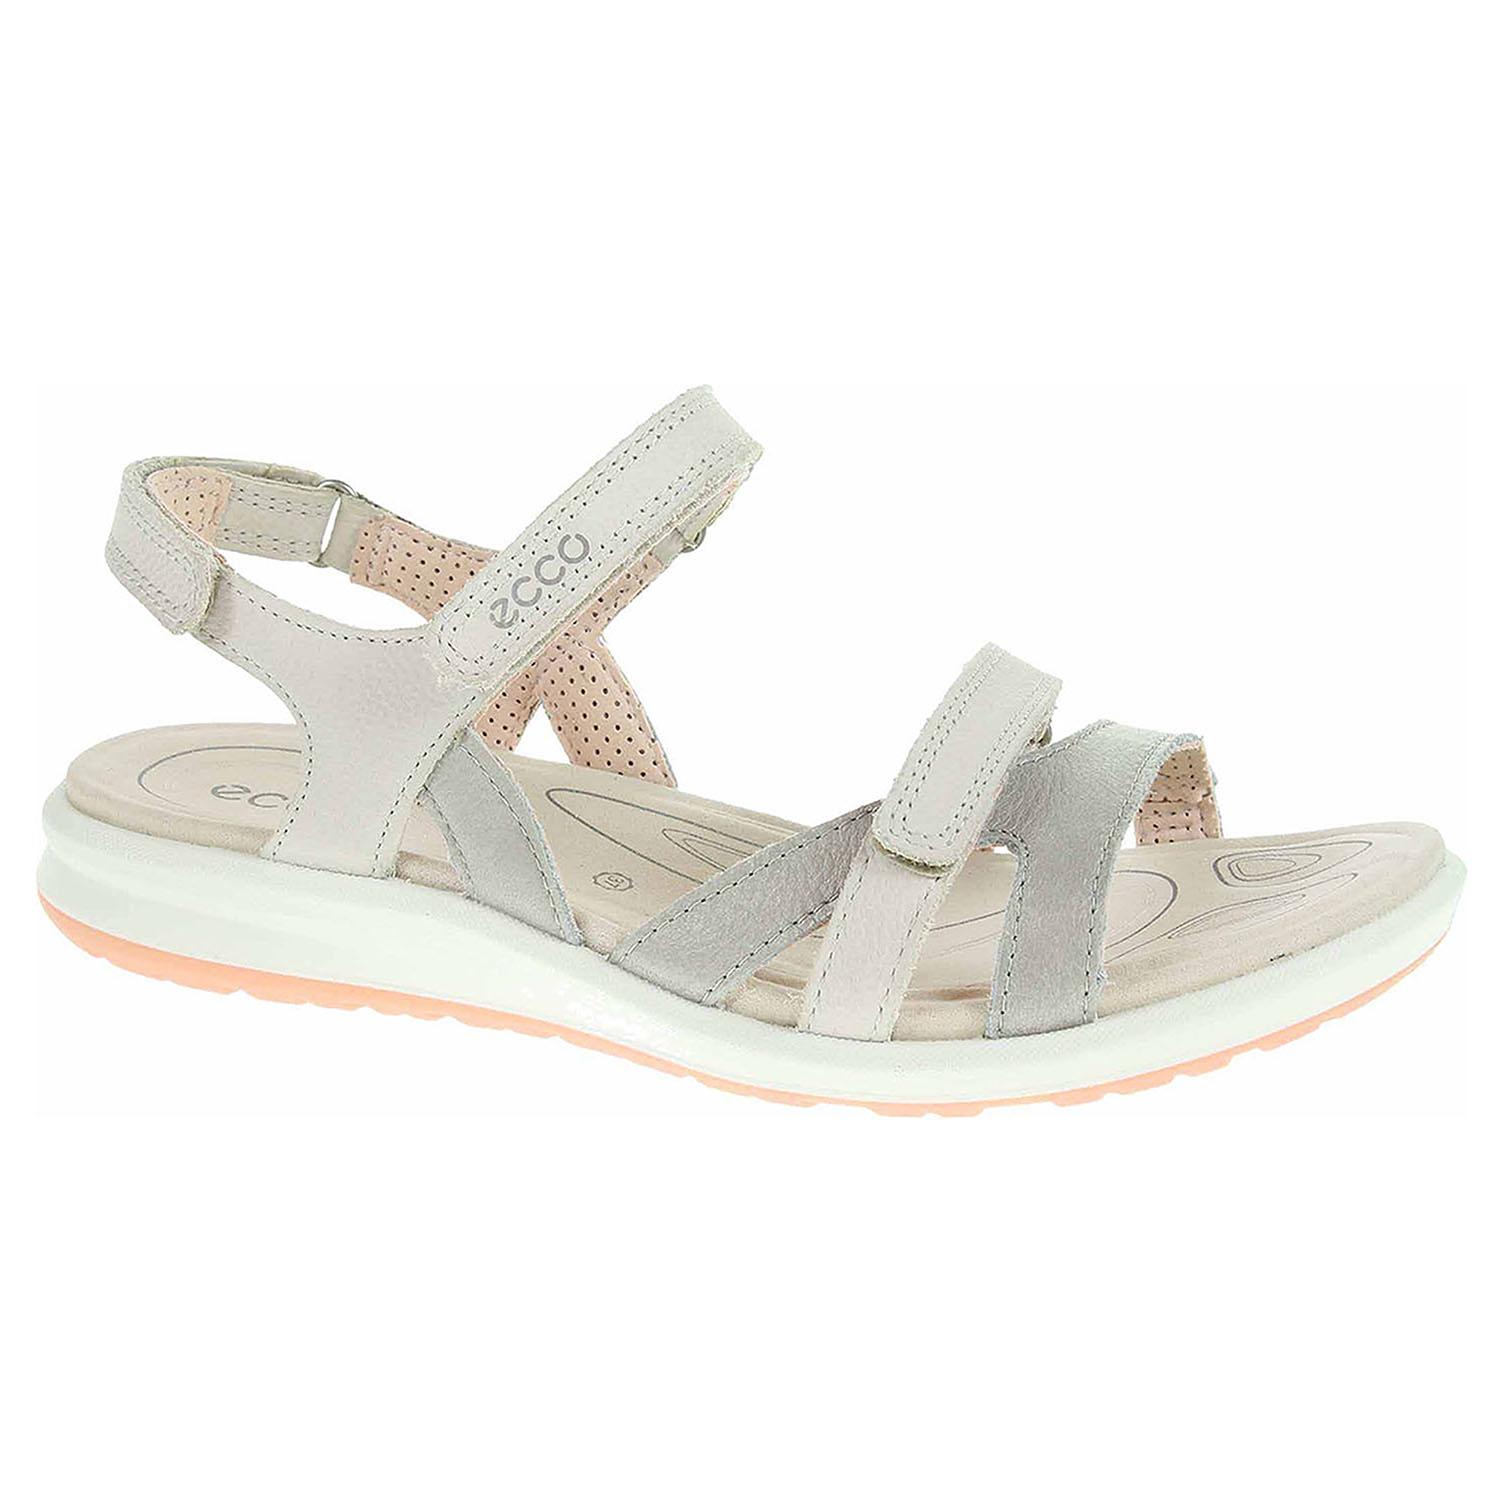 7169ecc103d4 detail Dámske sandále Ecco Cruise II 82183350862 silver grey-gravel-rose  dust